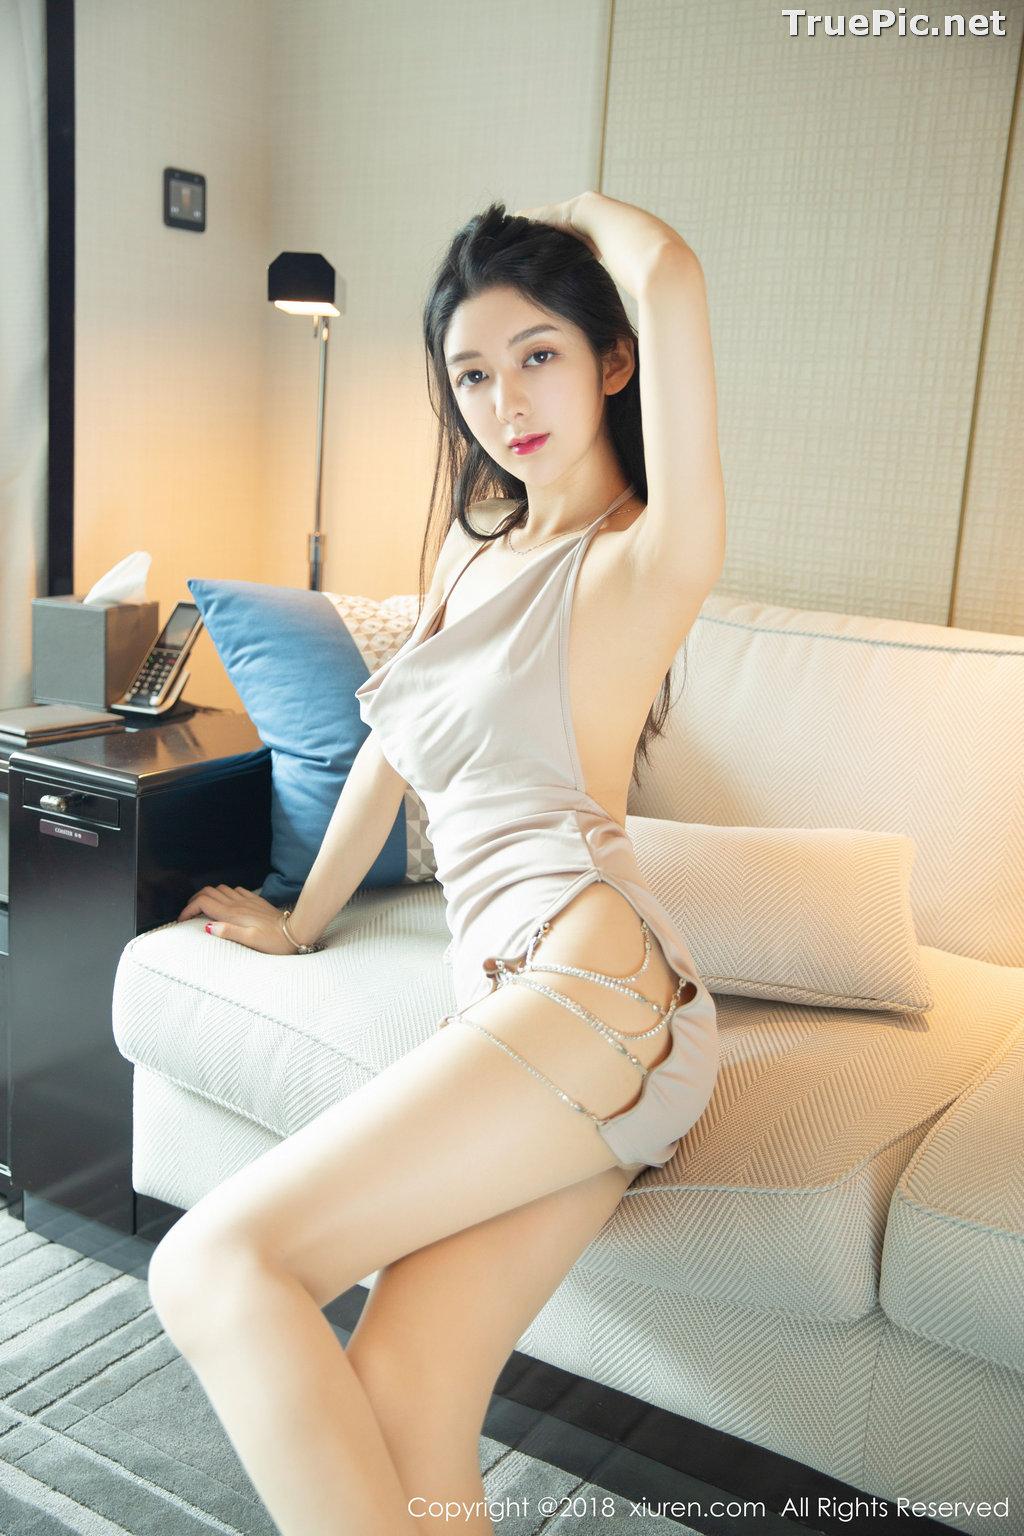 Image XIUREN No.1141 - Chinese Model - Xiao Reba (Angela小热巴) - Sexy Dress Tonight - TruePic.net - Picture-20